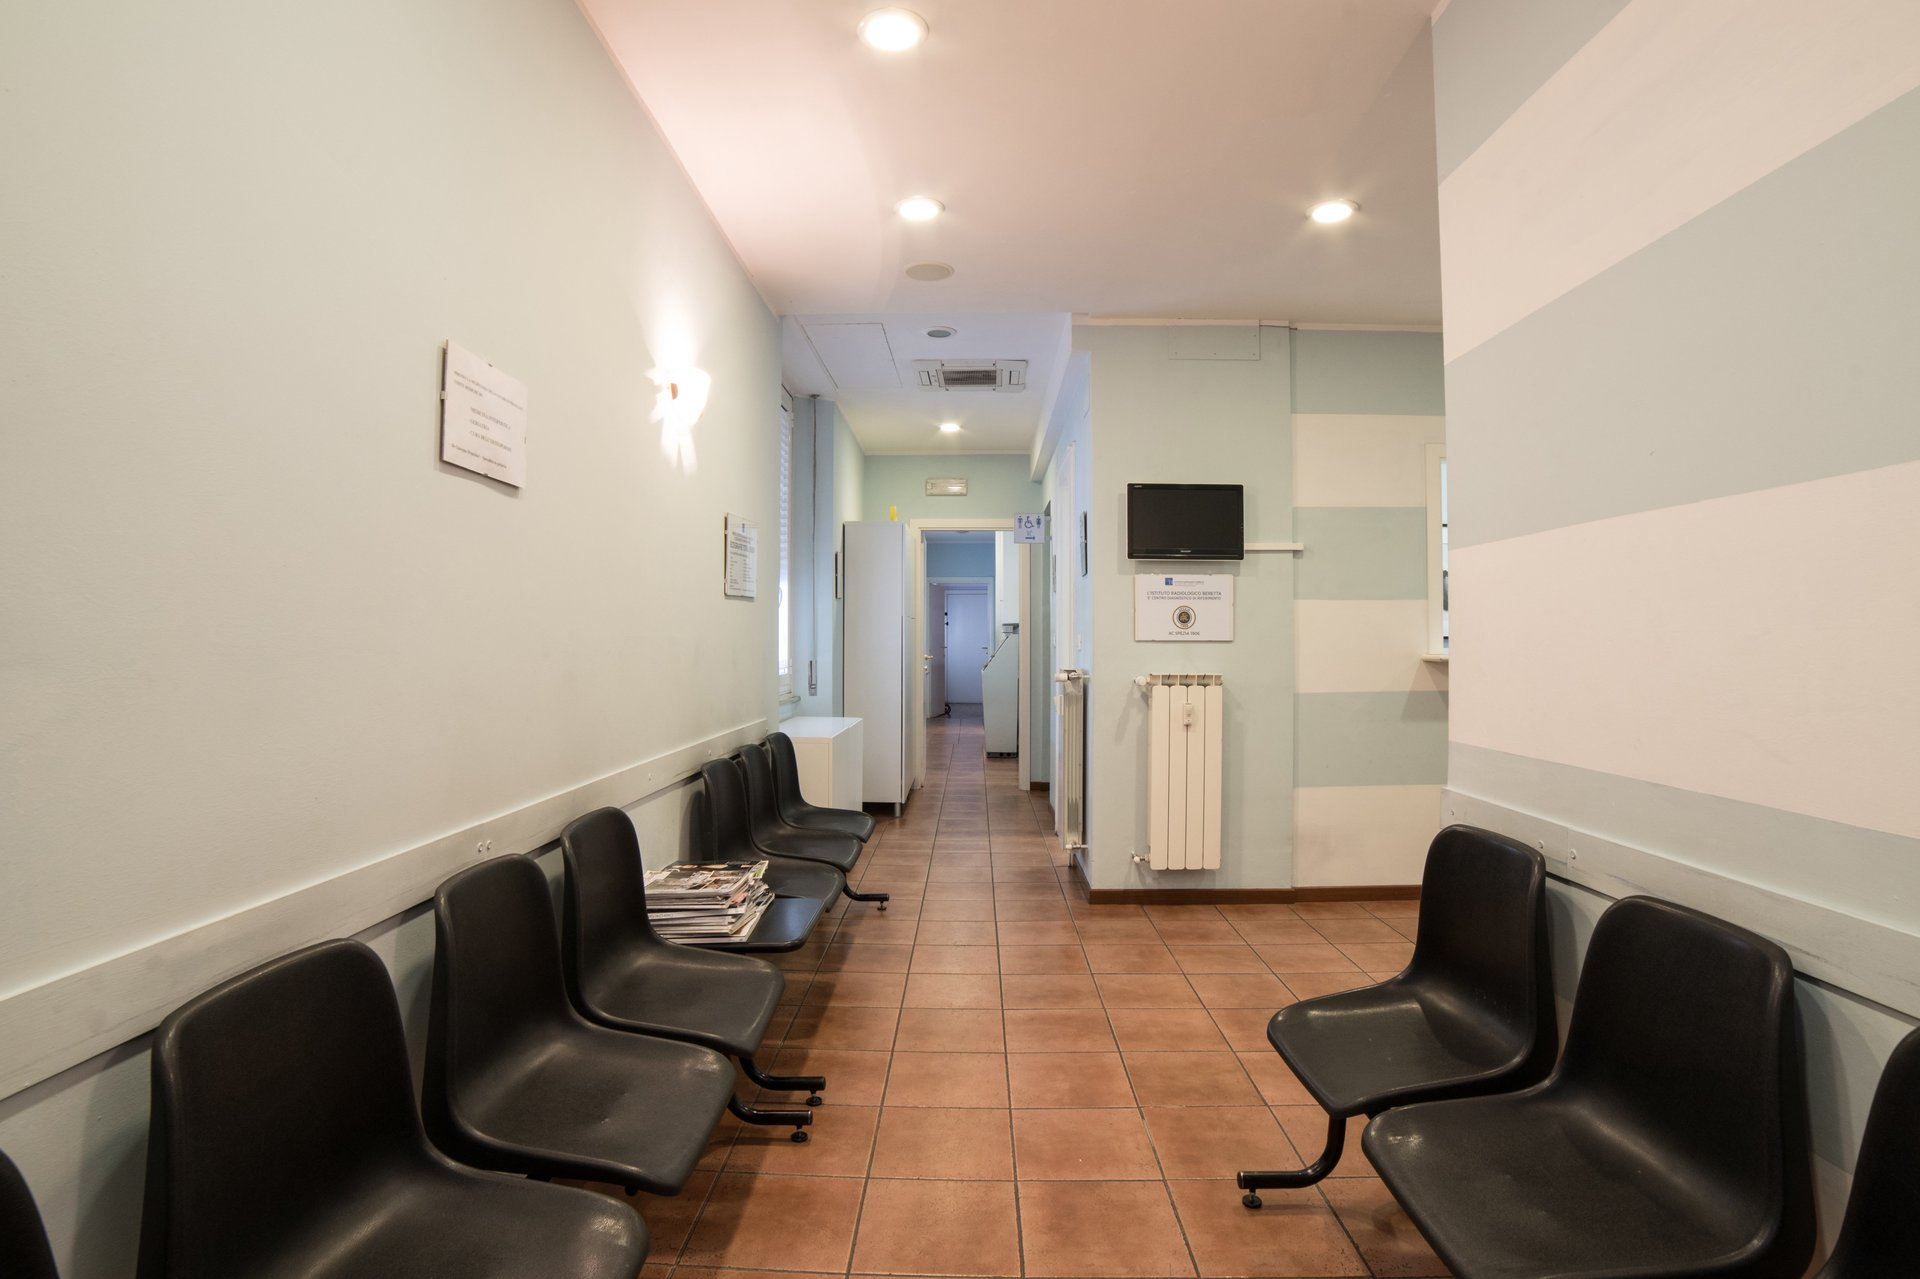 istituto radiologico beretta - sala d'attesa